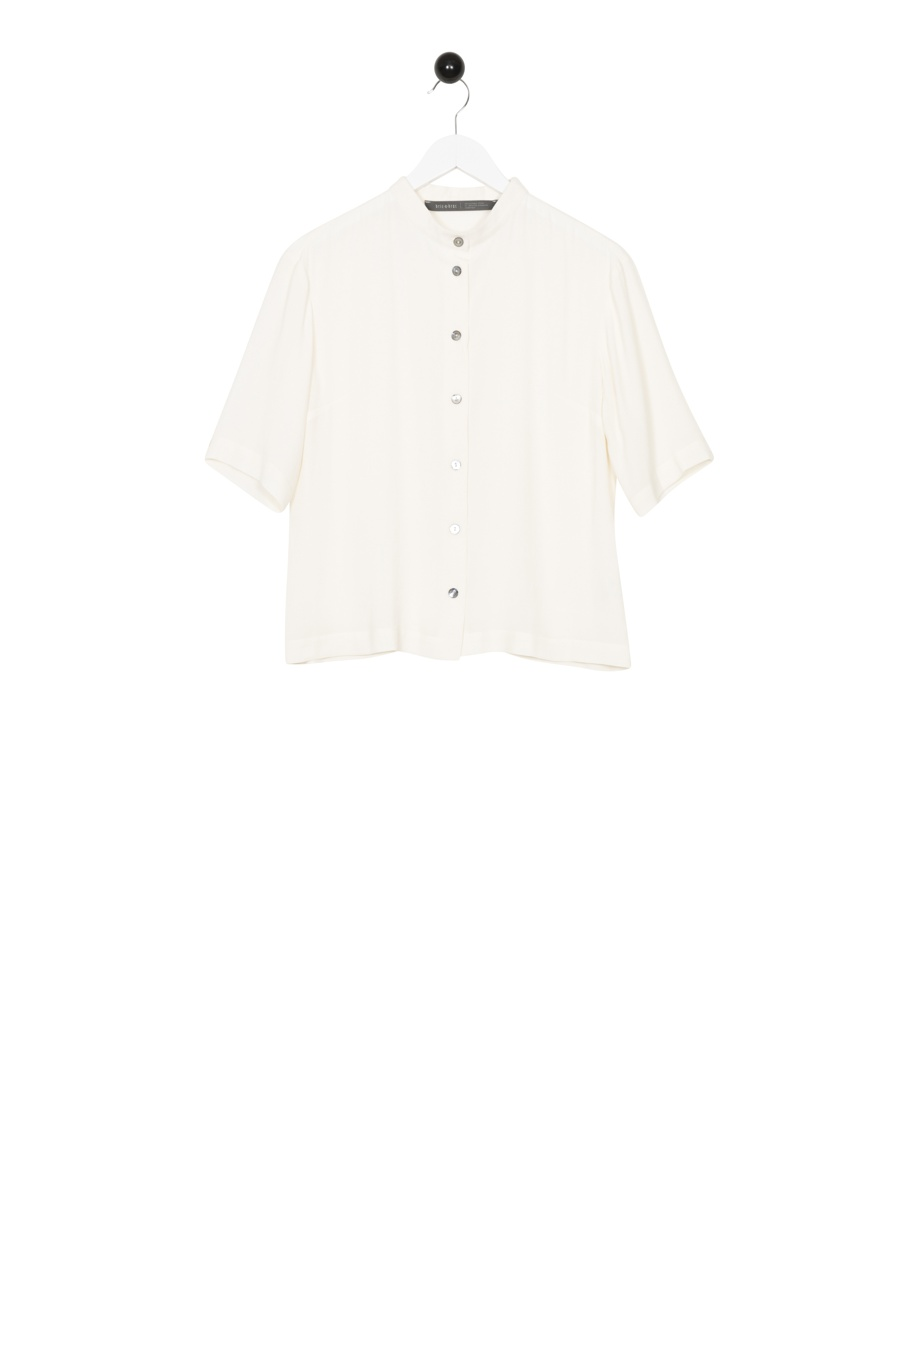 Liljeholmen Shirt